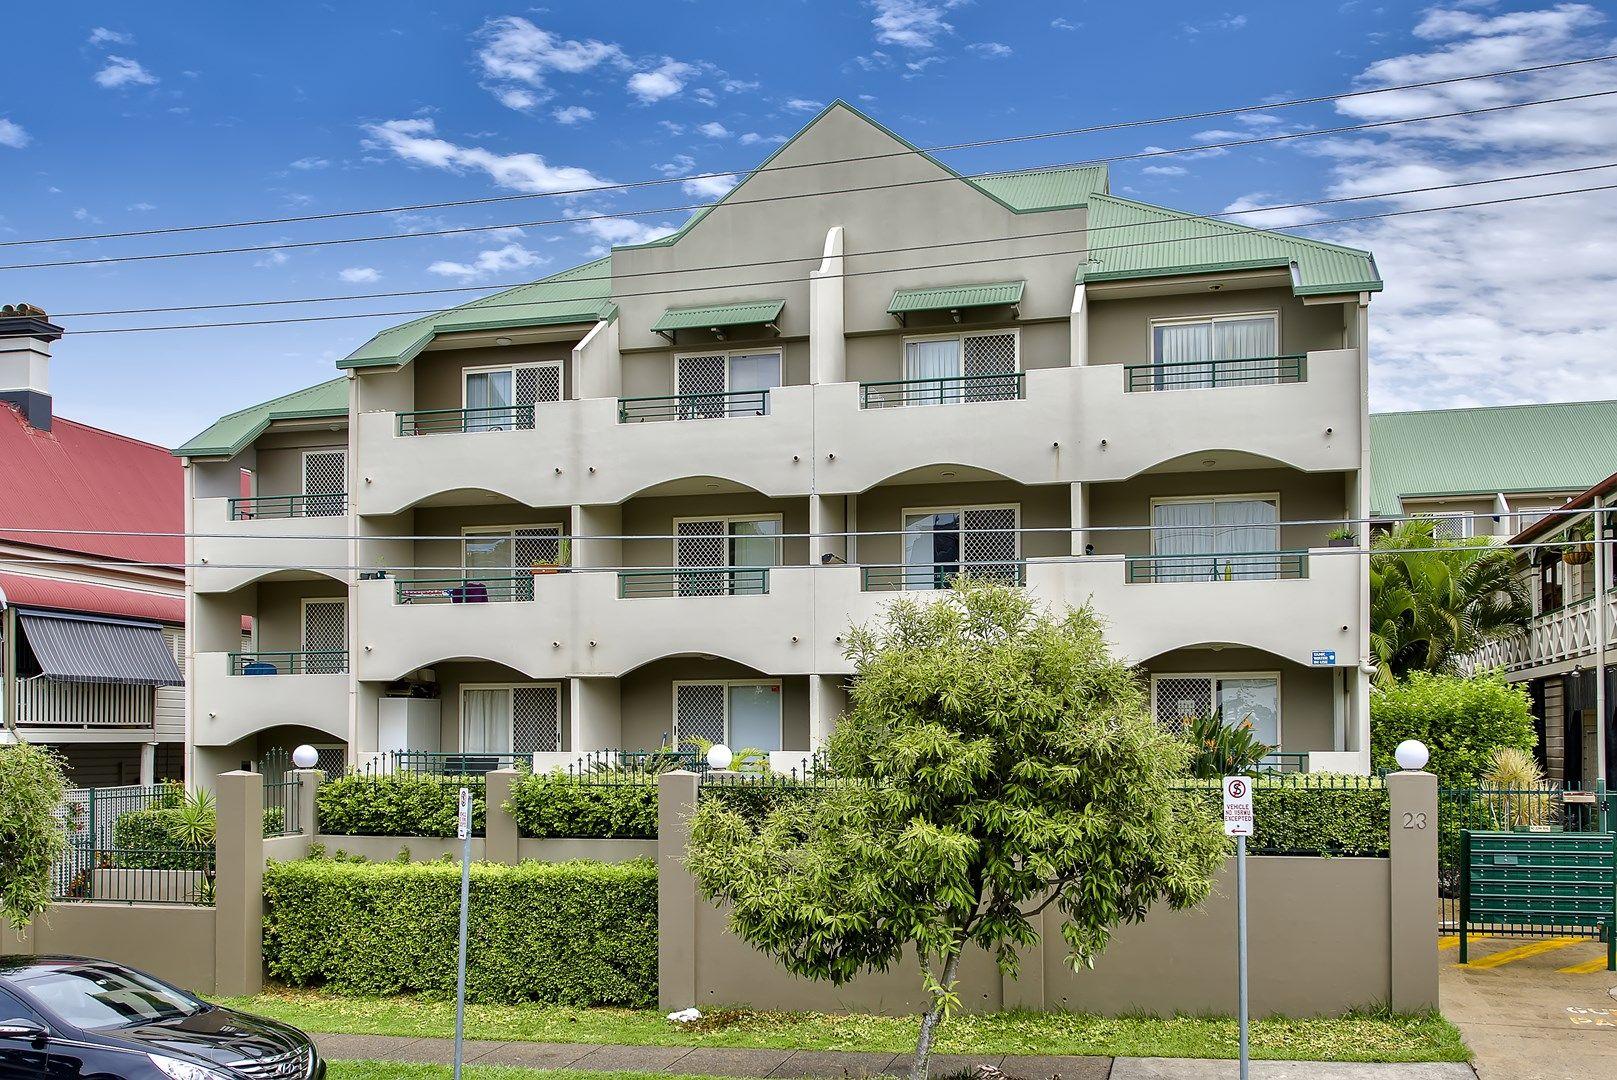 18/23 Edmondstone Street, South Brisbane QLD 4101, Image 0